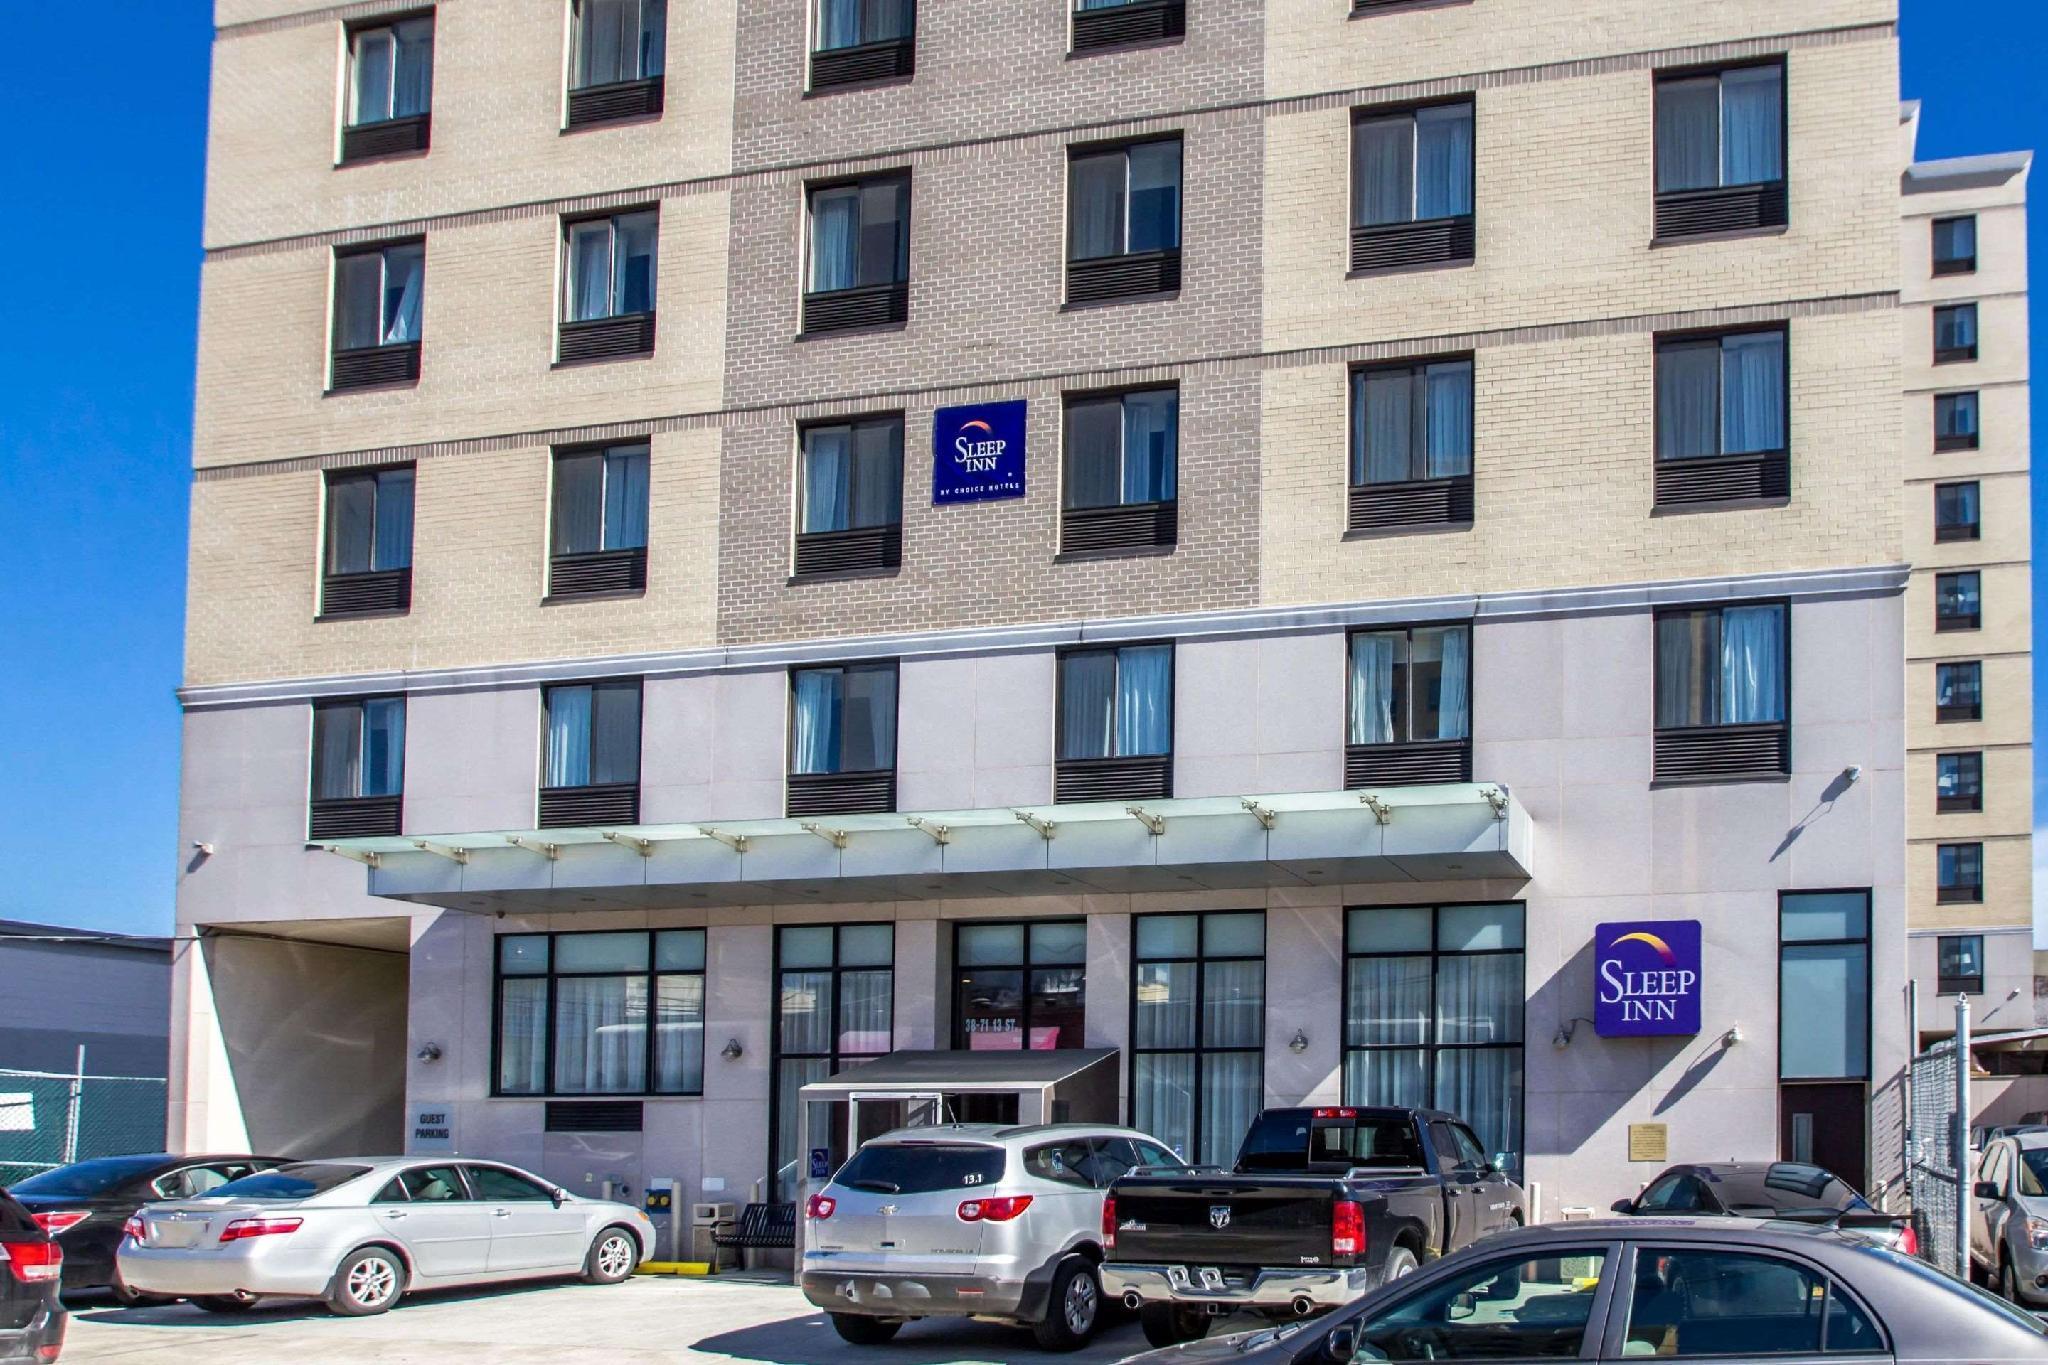 Sleep Inn Long Island City - Manhattan View